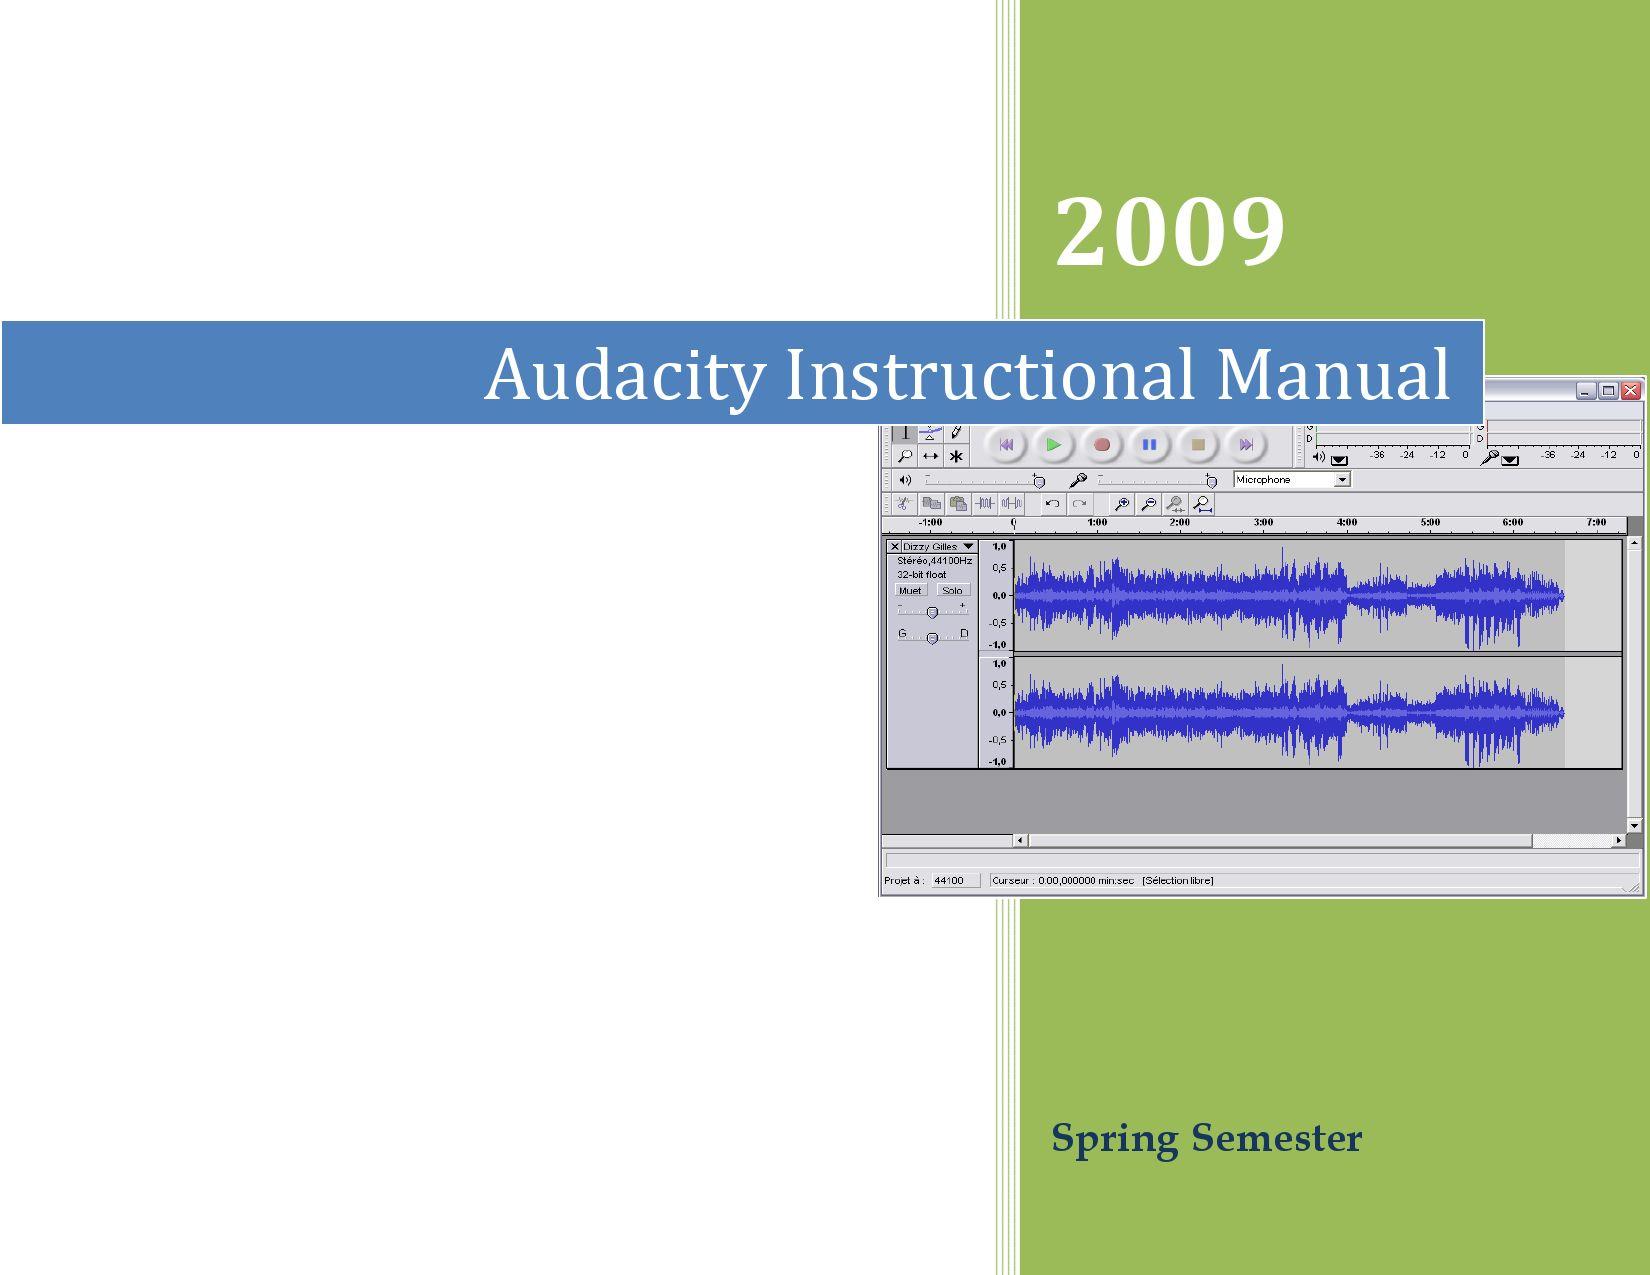 Adudacity audio application manual by Art to Life